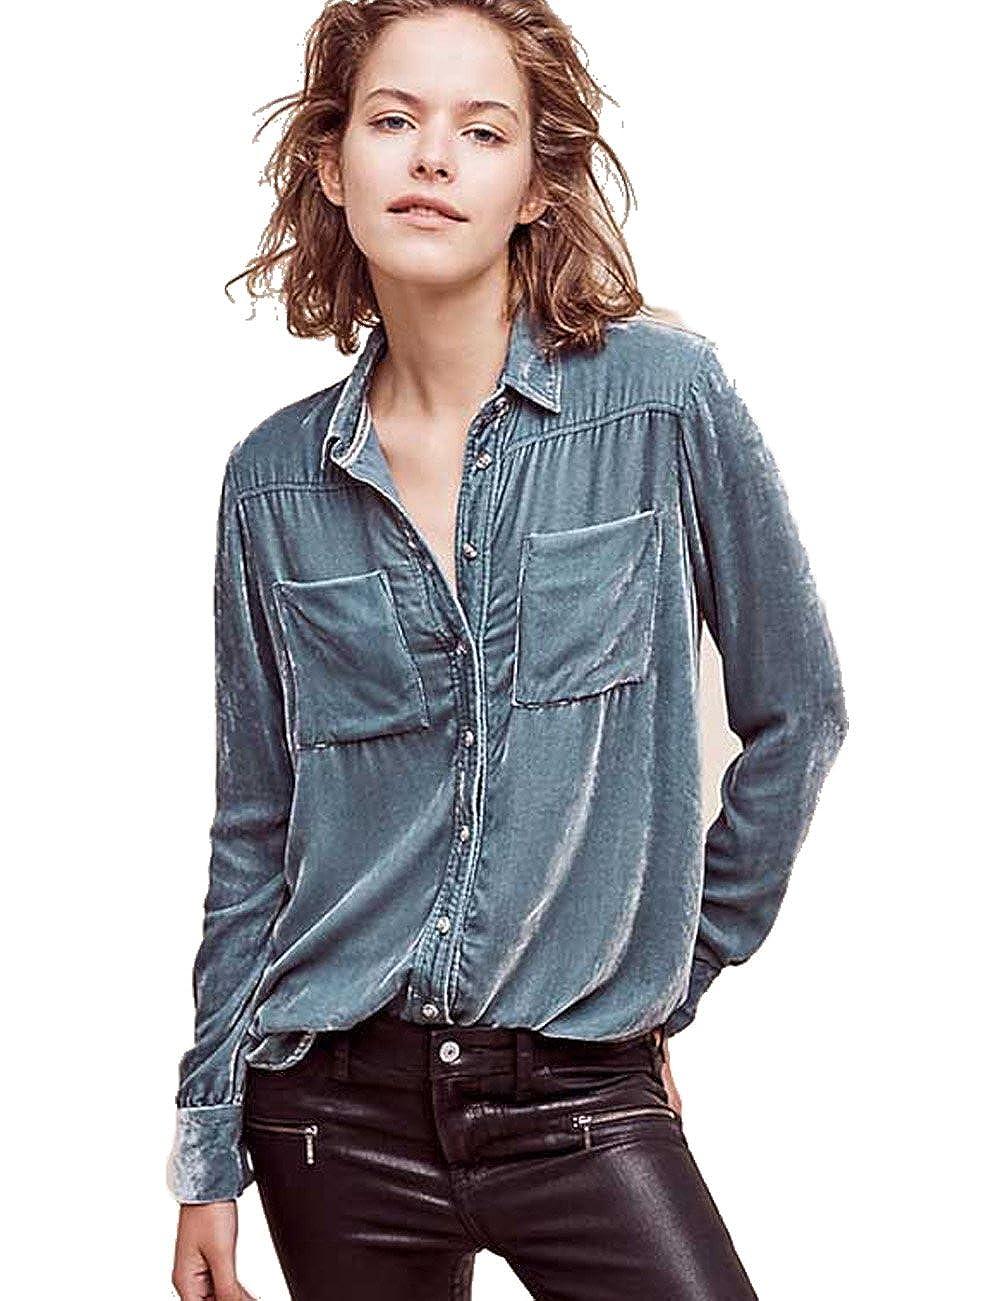 01a66d285ffad2 Womens Soft Velvet Blouse Long Sleeved Shirt Blouses at Amazon Women's  Clothing store: